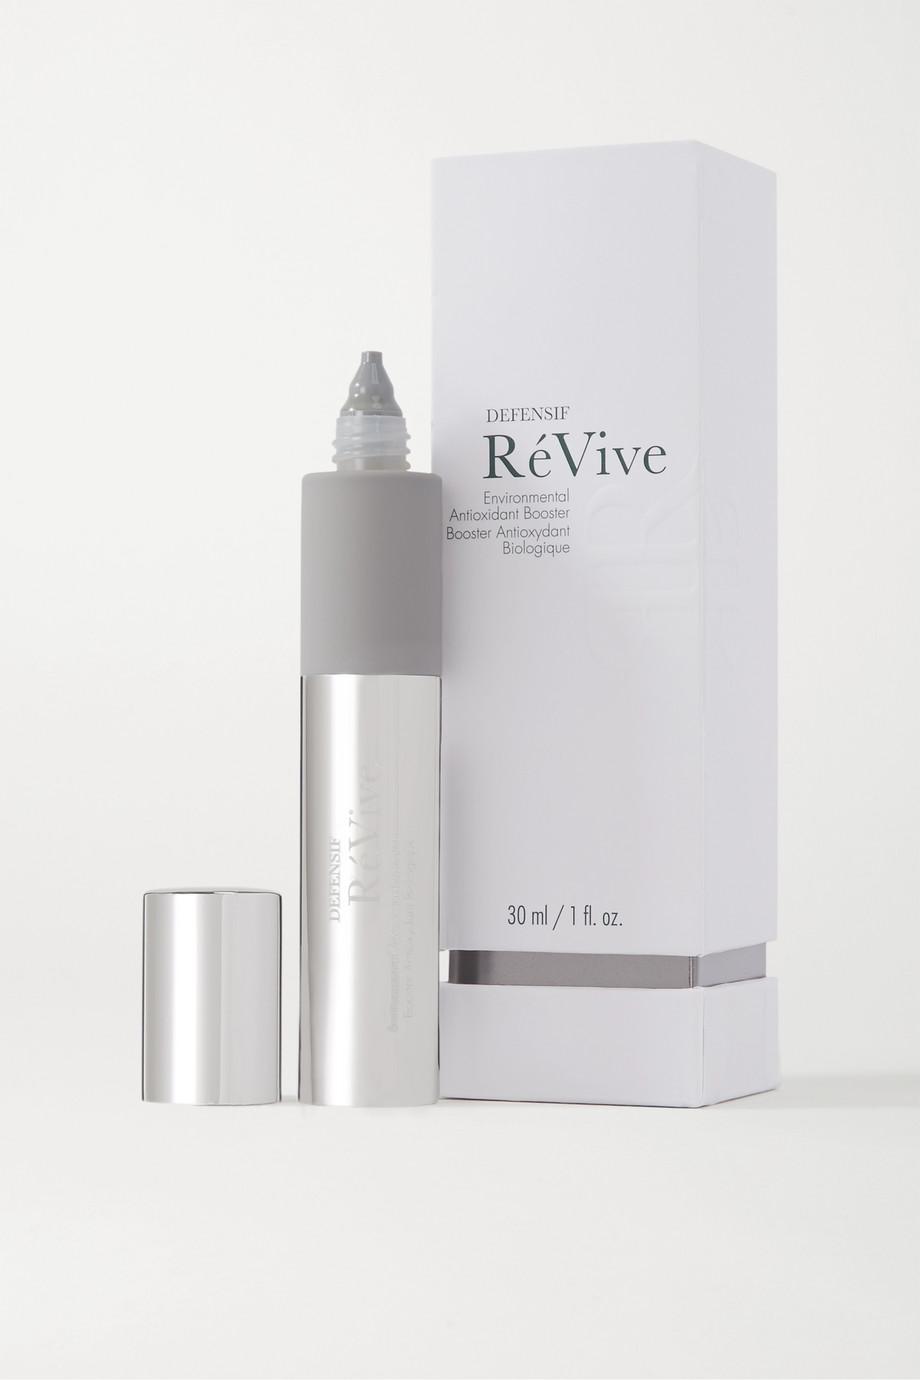 RéVive Defensif Environmental Antioxidant Booster, 30 ml – Serum